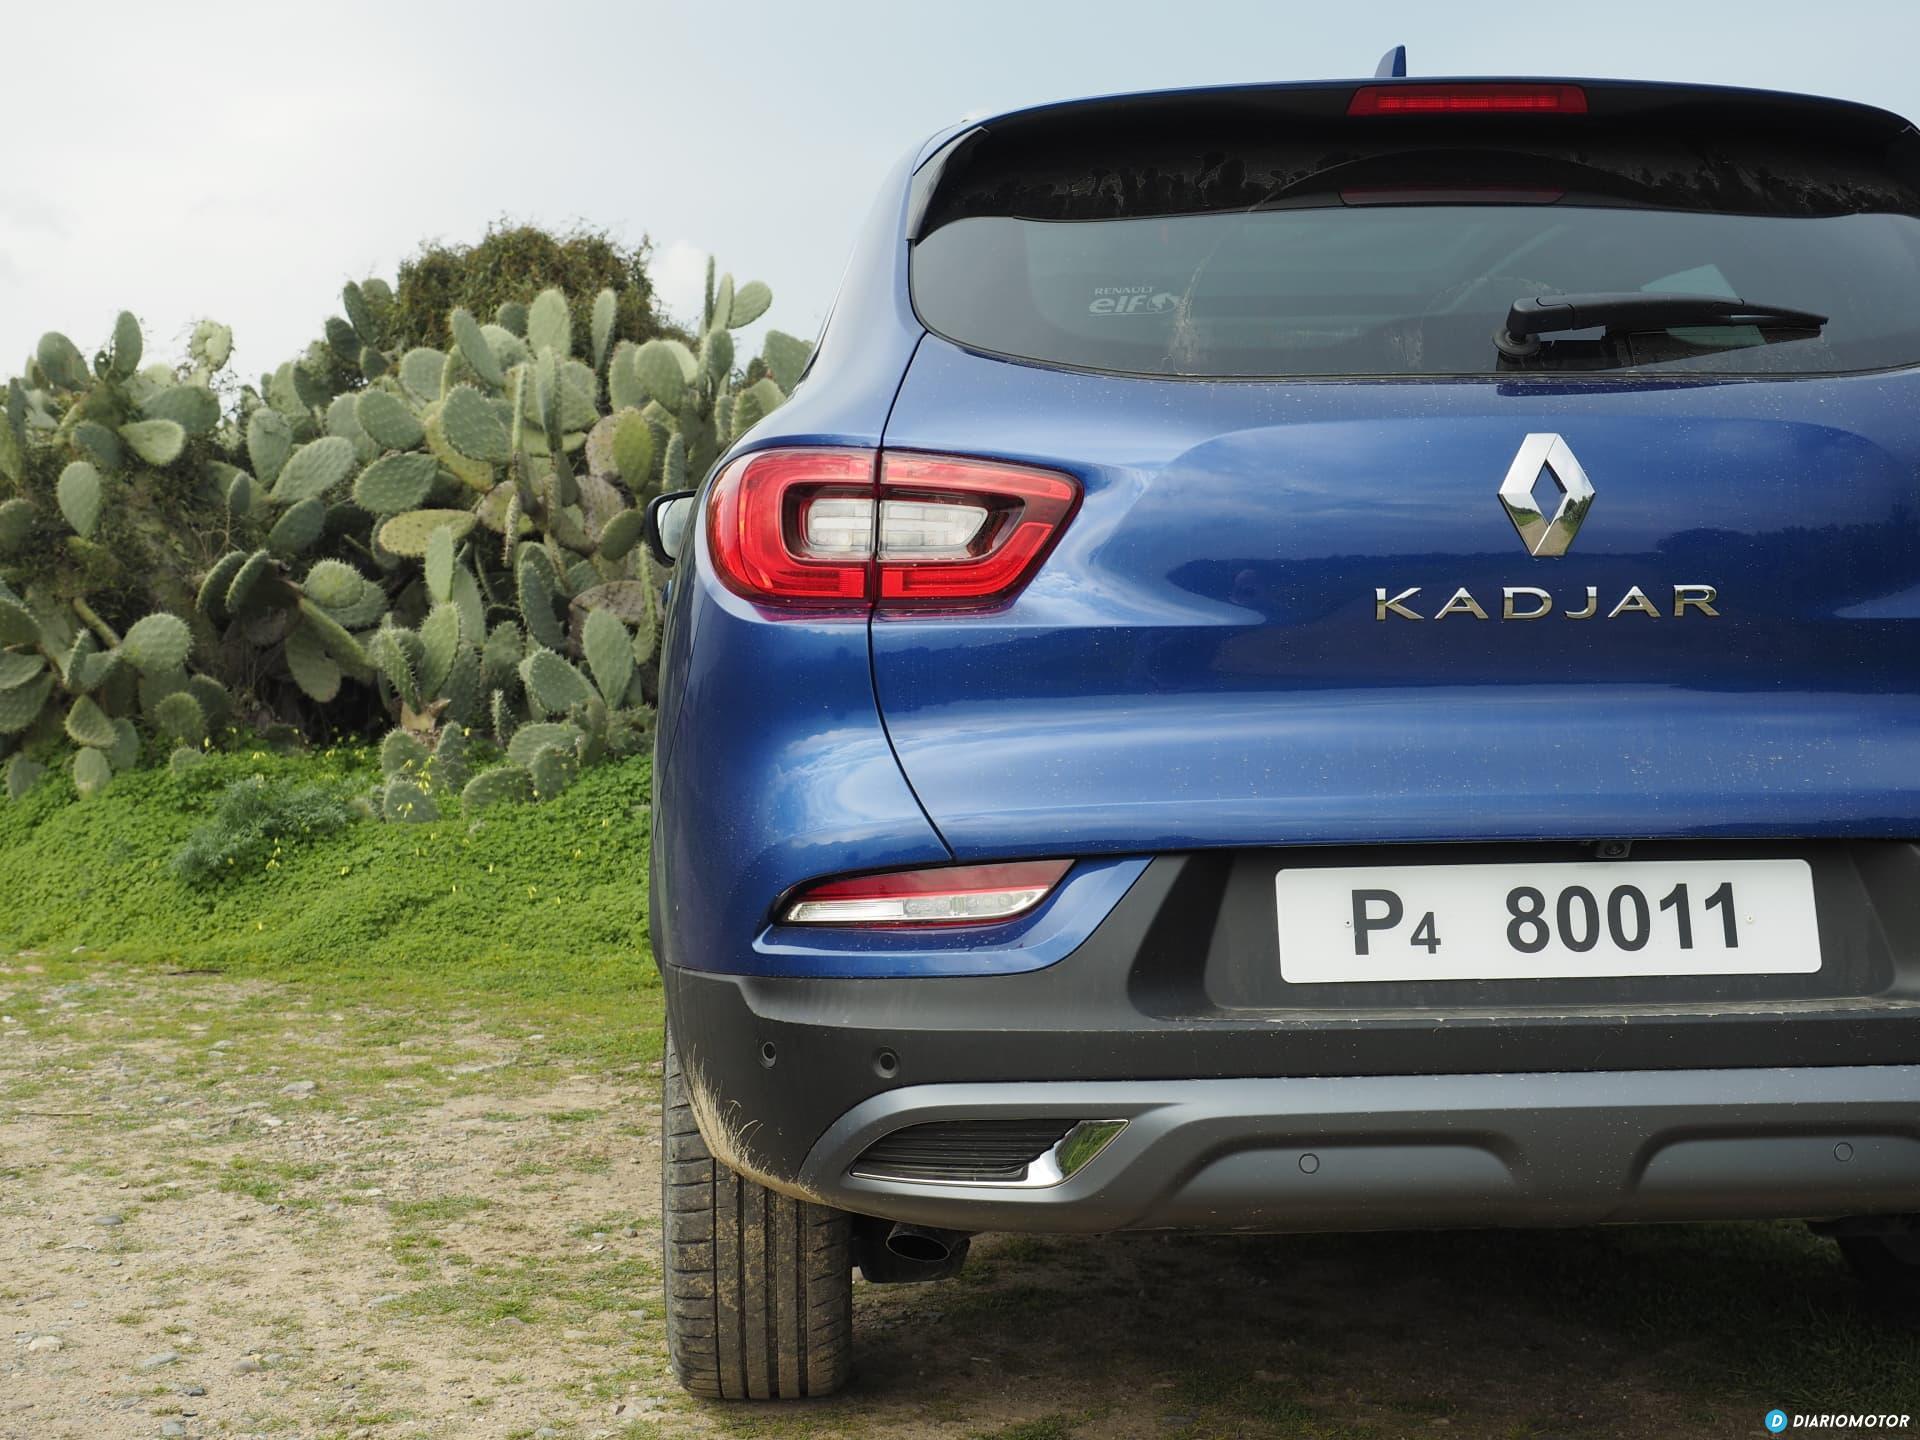 Renault Kadjar 2019 Exterior 00004